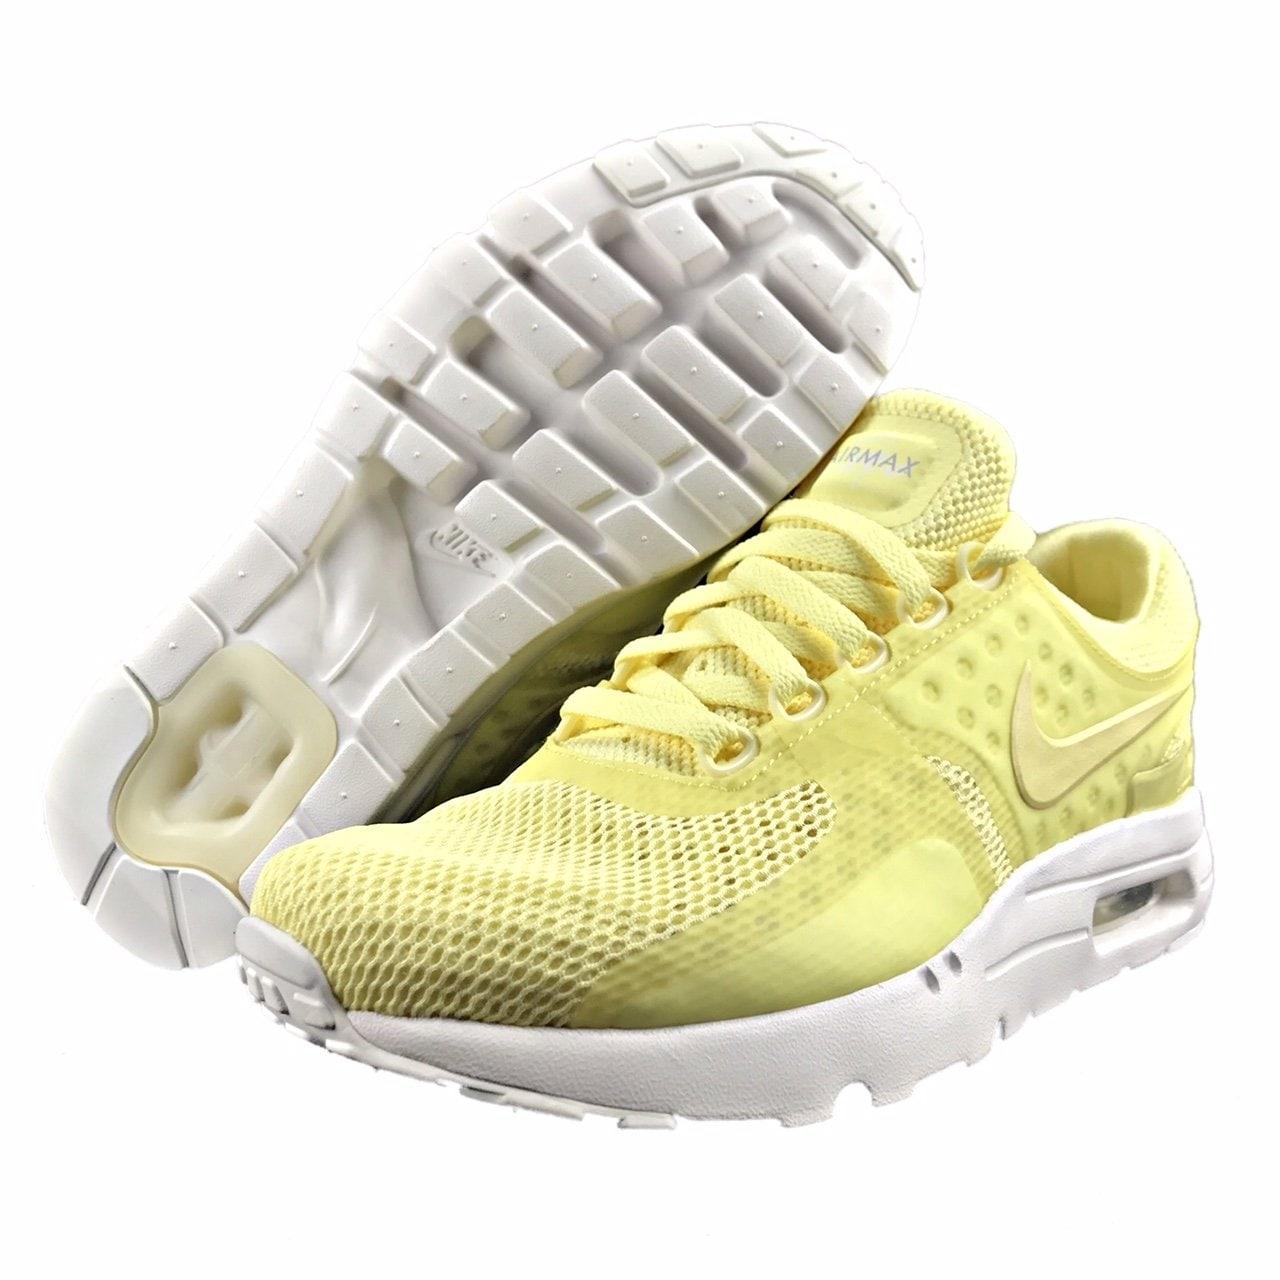 on sale ffa1d 3c874 Men's Nike Air Max Zero BR Shoe, Lemon Chiffon/Lemon Chiffon, 8 B(M) US